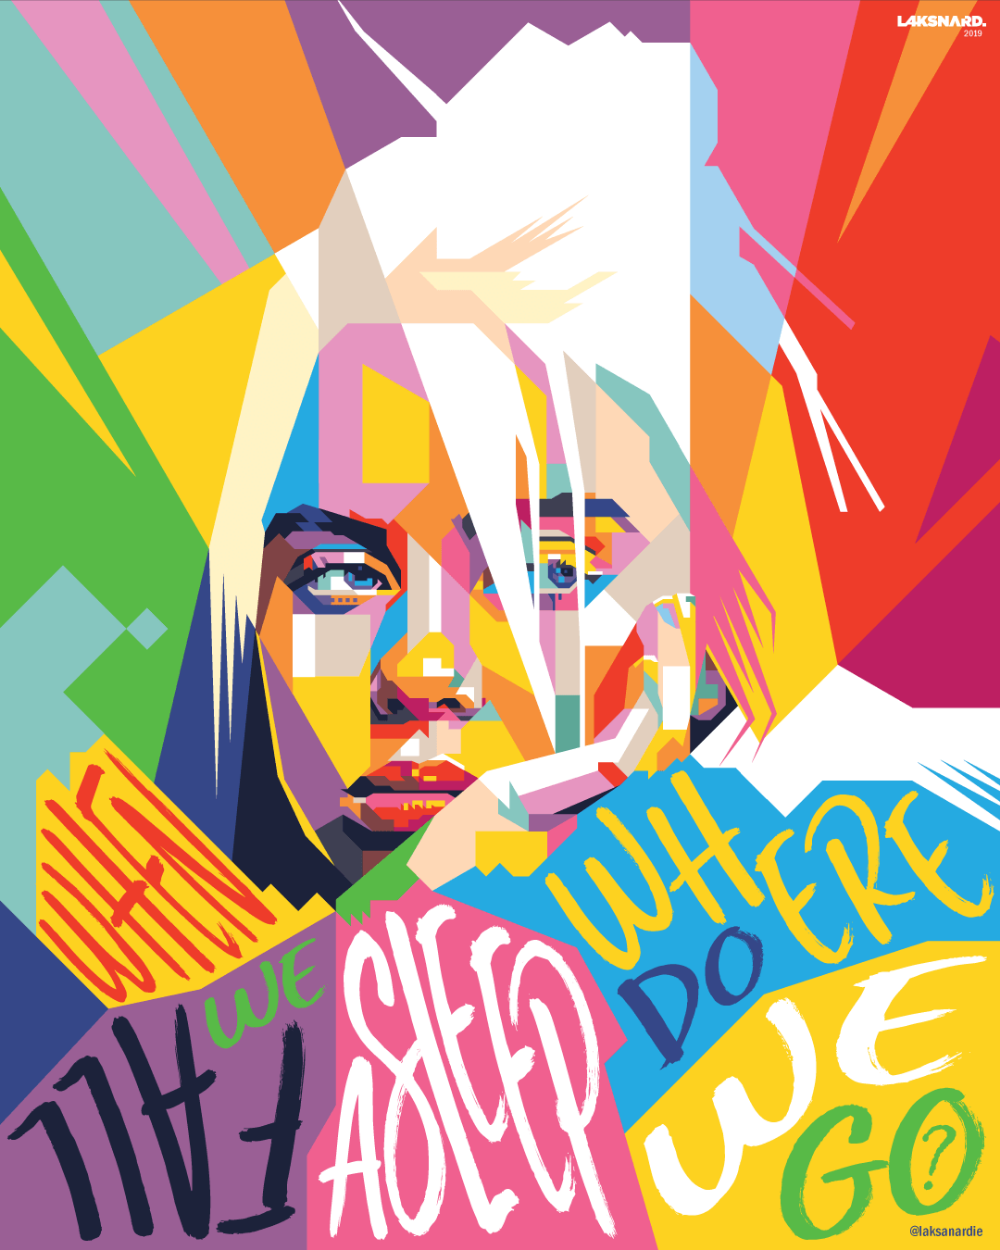 Billie Eillish Wpap By Laksanardie On Deviantart Poster Prints Pop Art Pop Art Posters